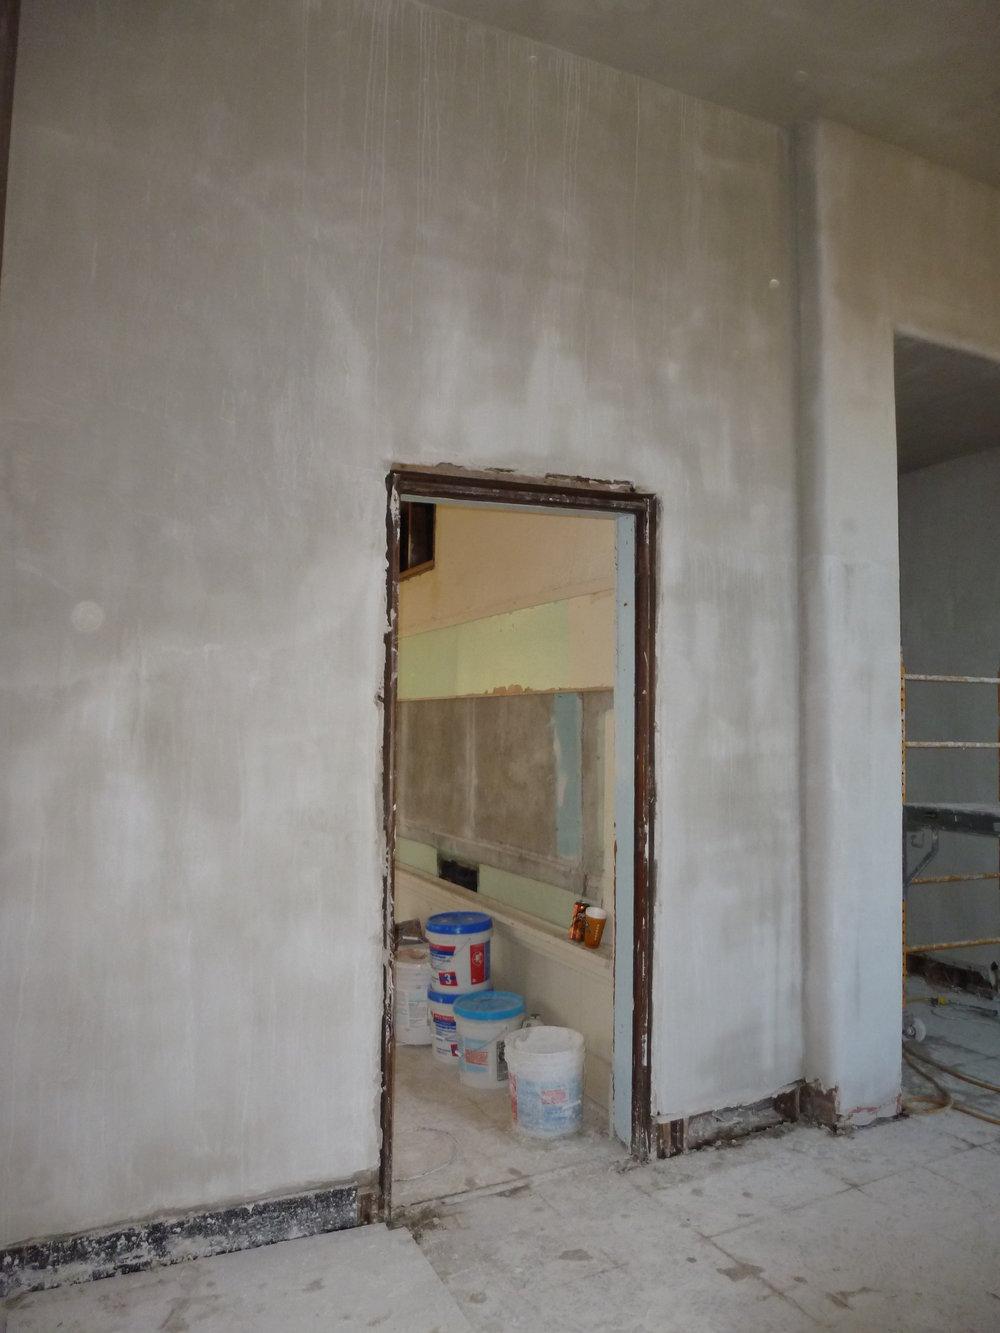 Drywall began